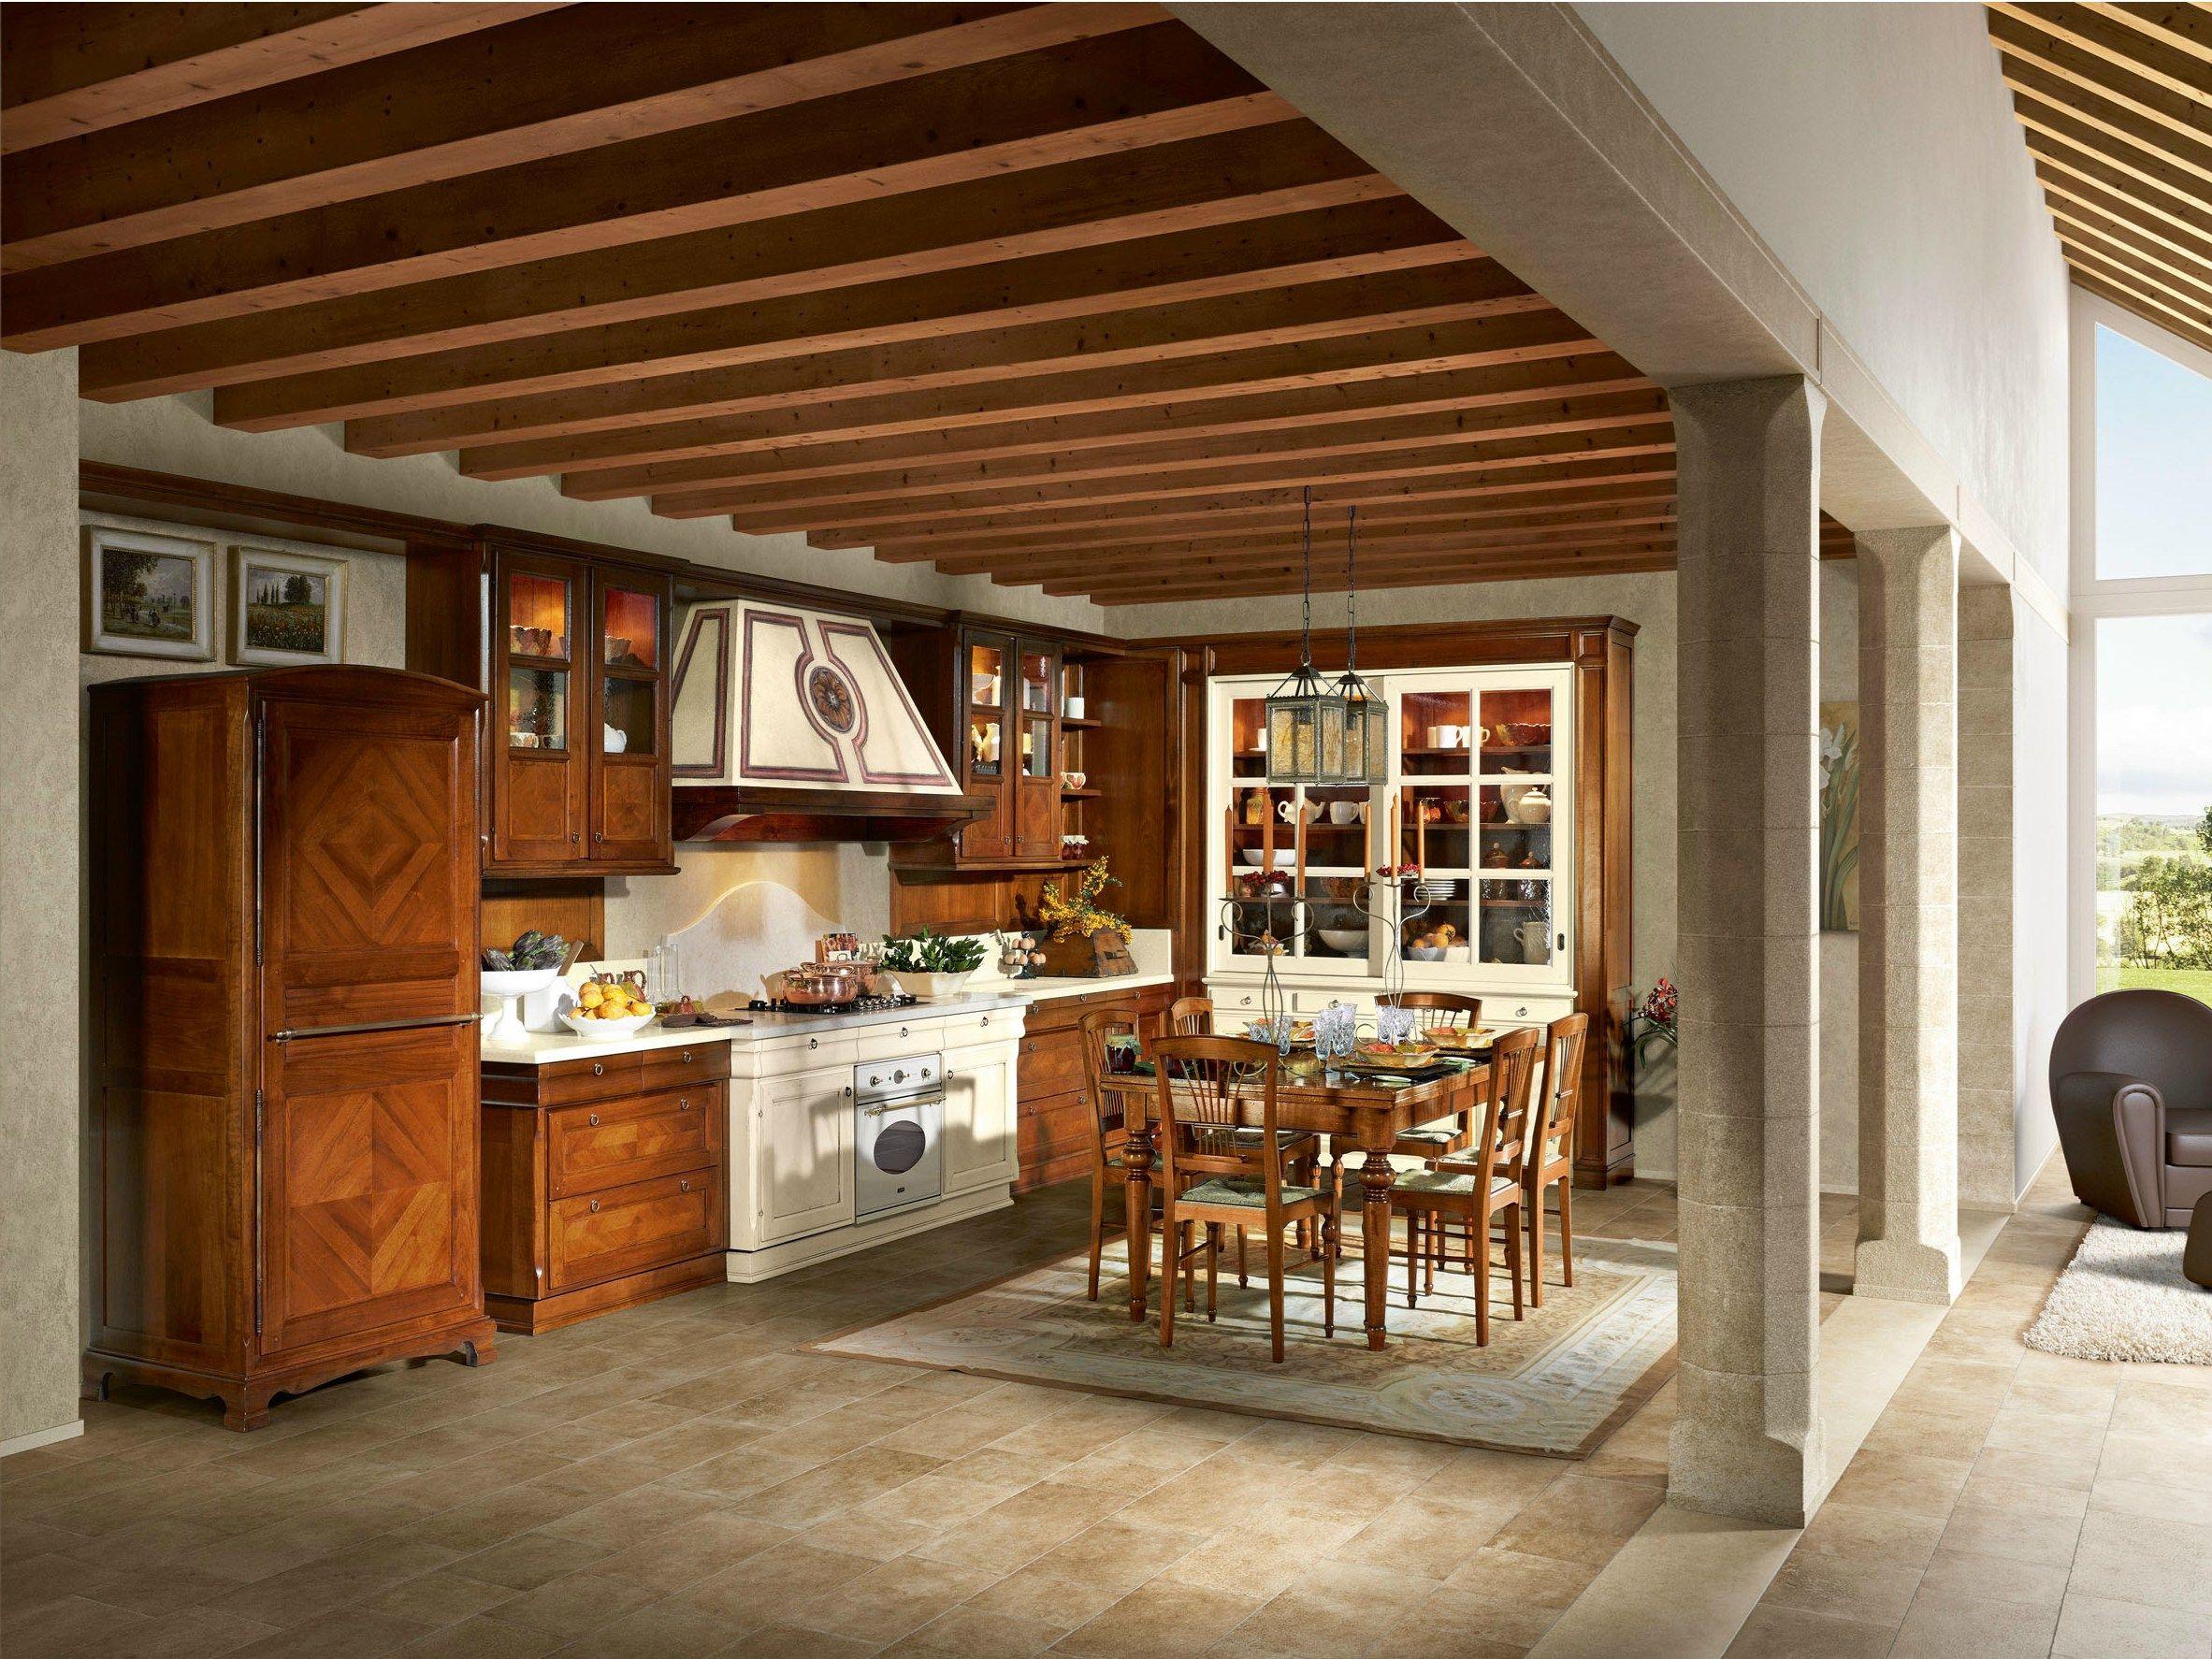 Antiqua cuisine sur mesure by l'ottocento